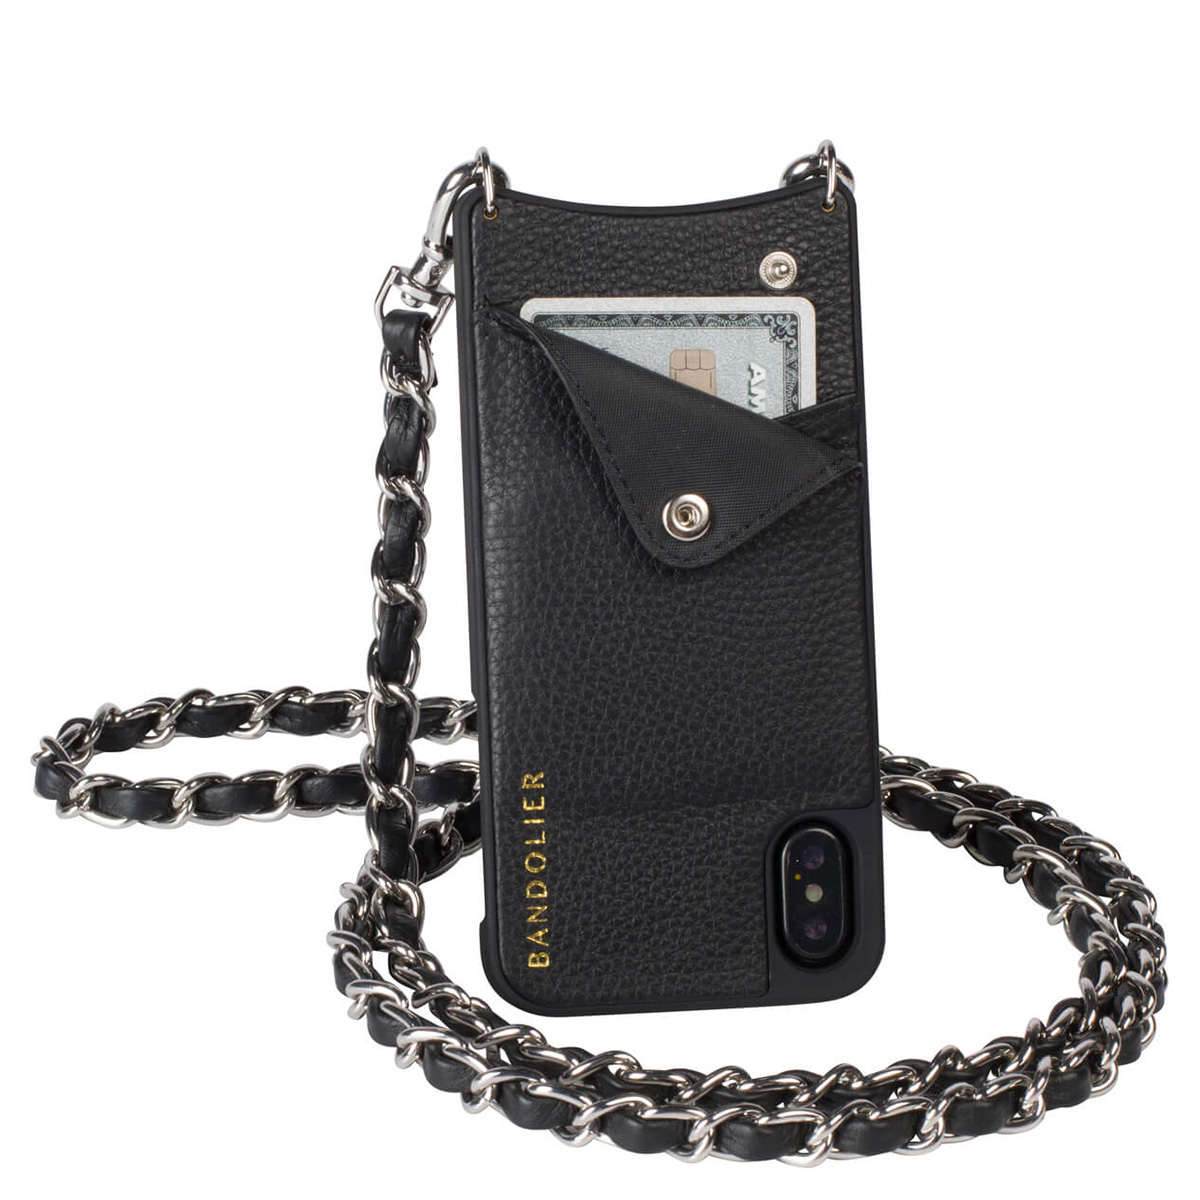 BANDOLIER iPhone XS MAX LUCY SILVER バンドリヤー ケース ショルダー スマホ アイフォン レザー メンズ レディース ブラック 10LCY1001